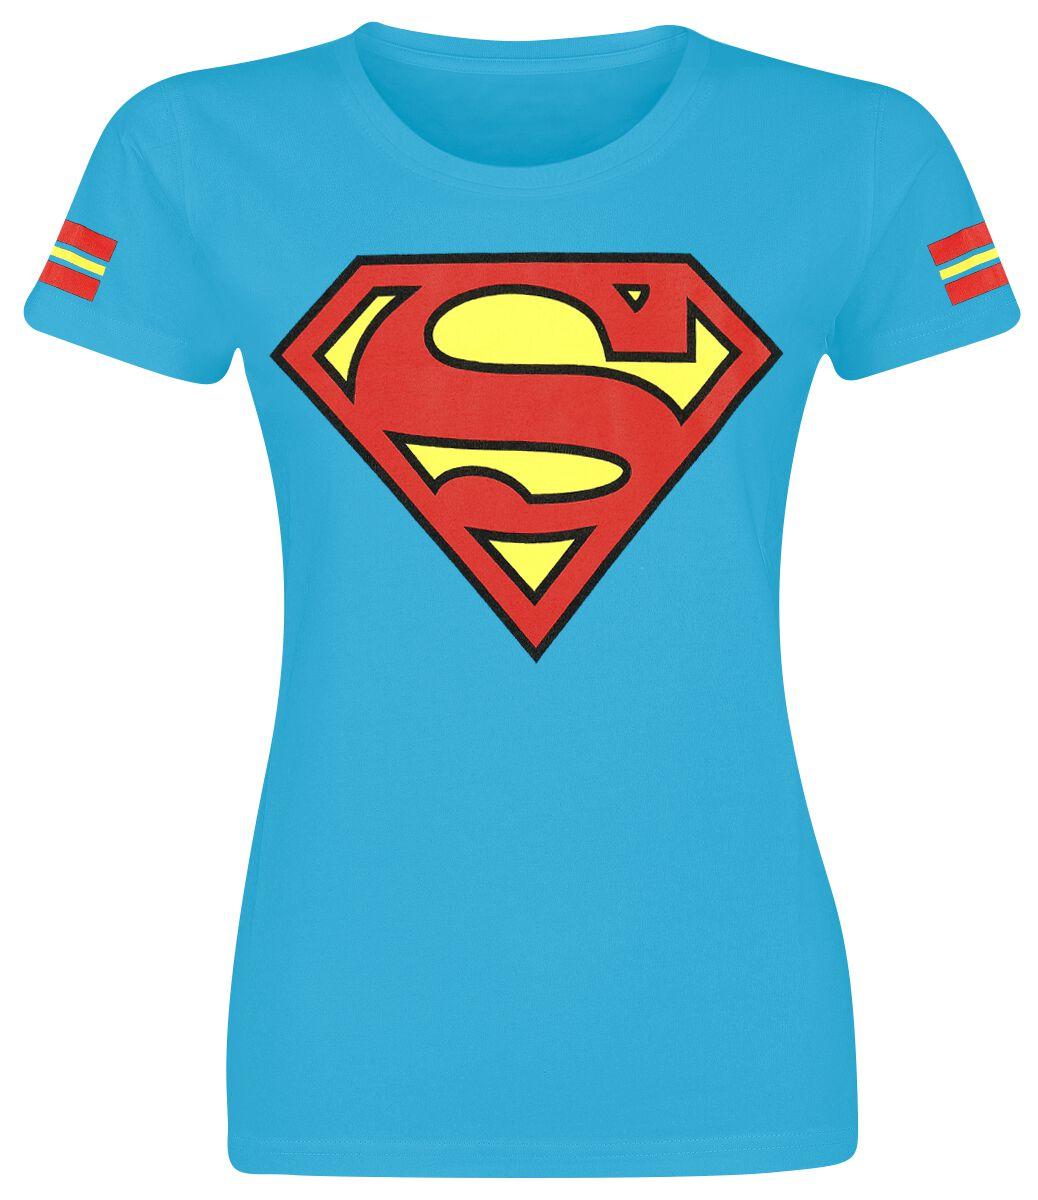 Merch dla Fanów - Koszulki - Koszulka damska Superman Logo Koszulka damska niebieski - 361145